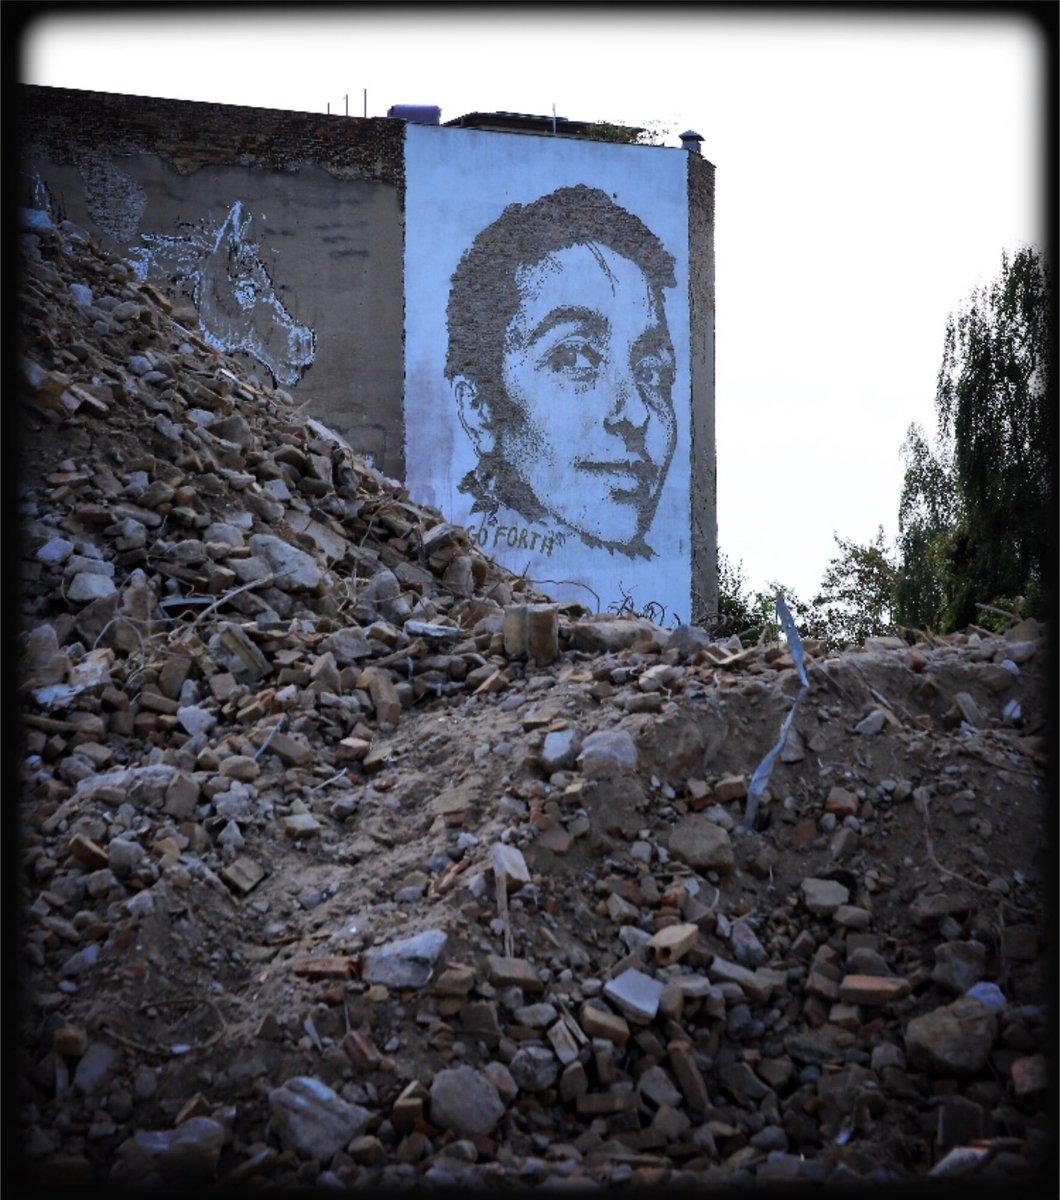 ... facing demolition ... #berlin #building #urban #streetart #mural #demolition #deconstruction #mood #smile #change #citylife #history<br>http://pic.twitter.com/b3Ra7xfei5